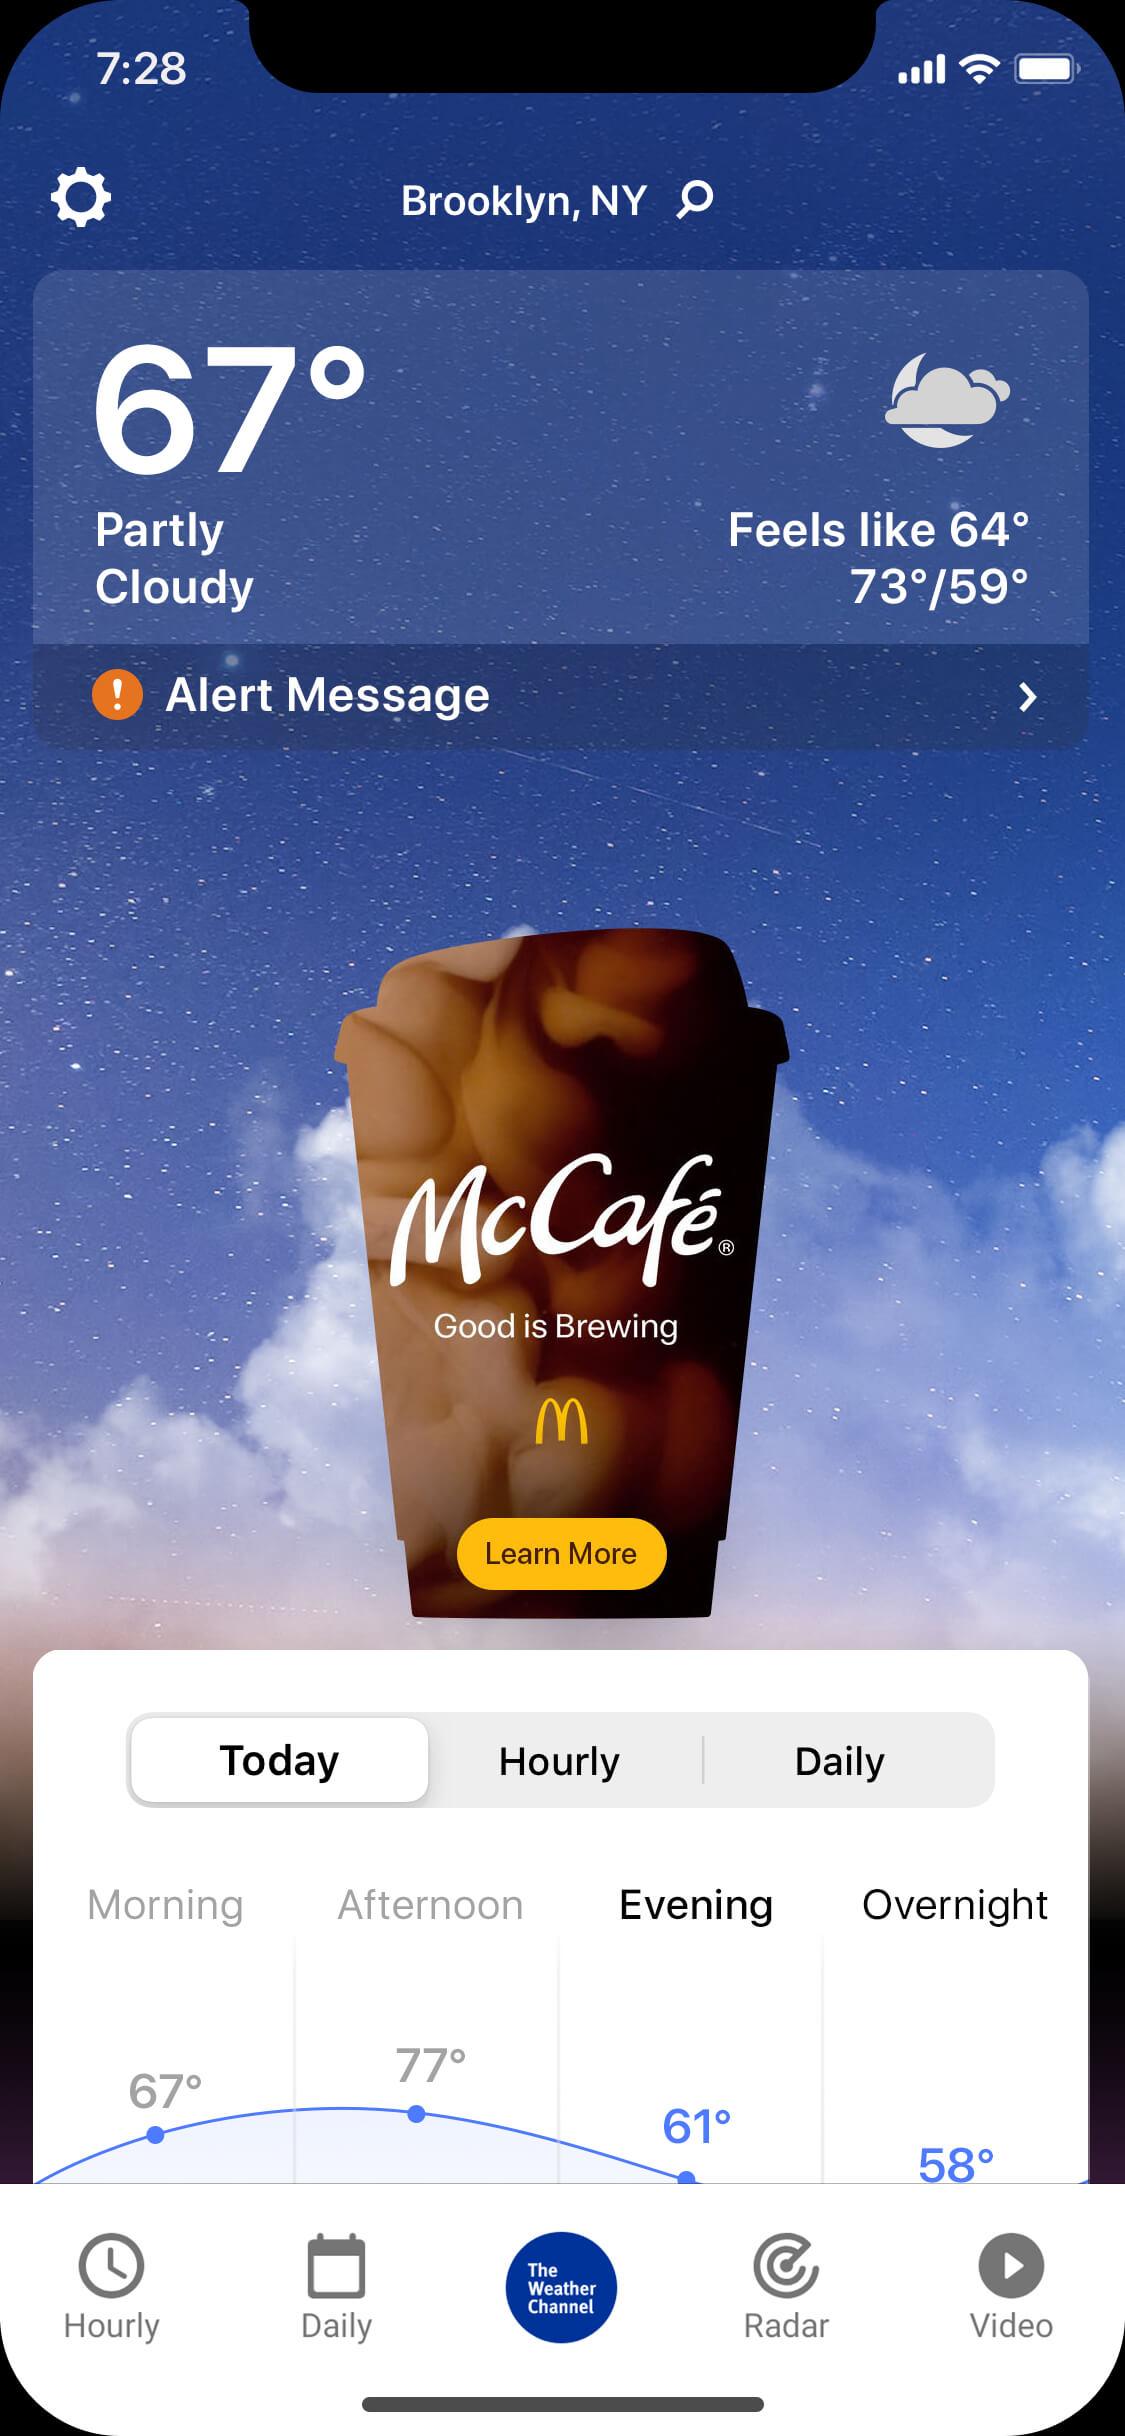 McCafe_cloudy_night